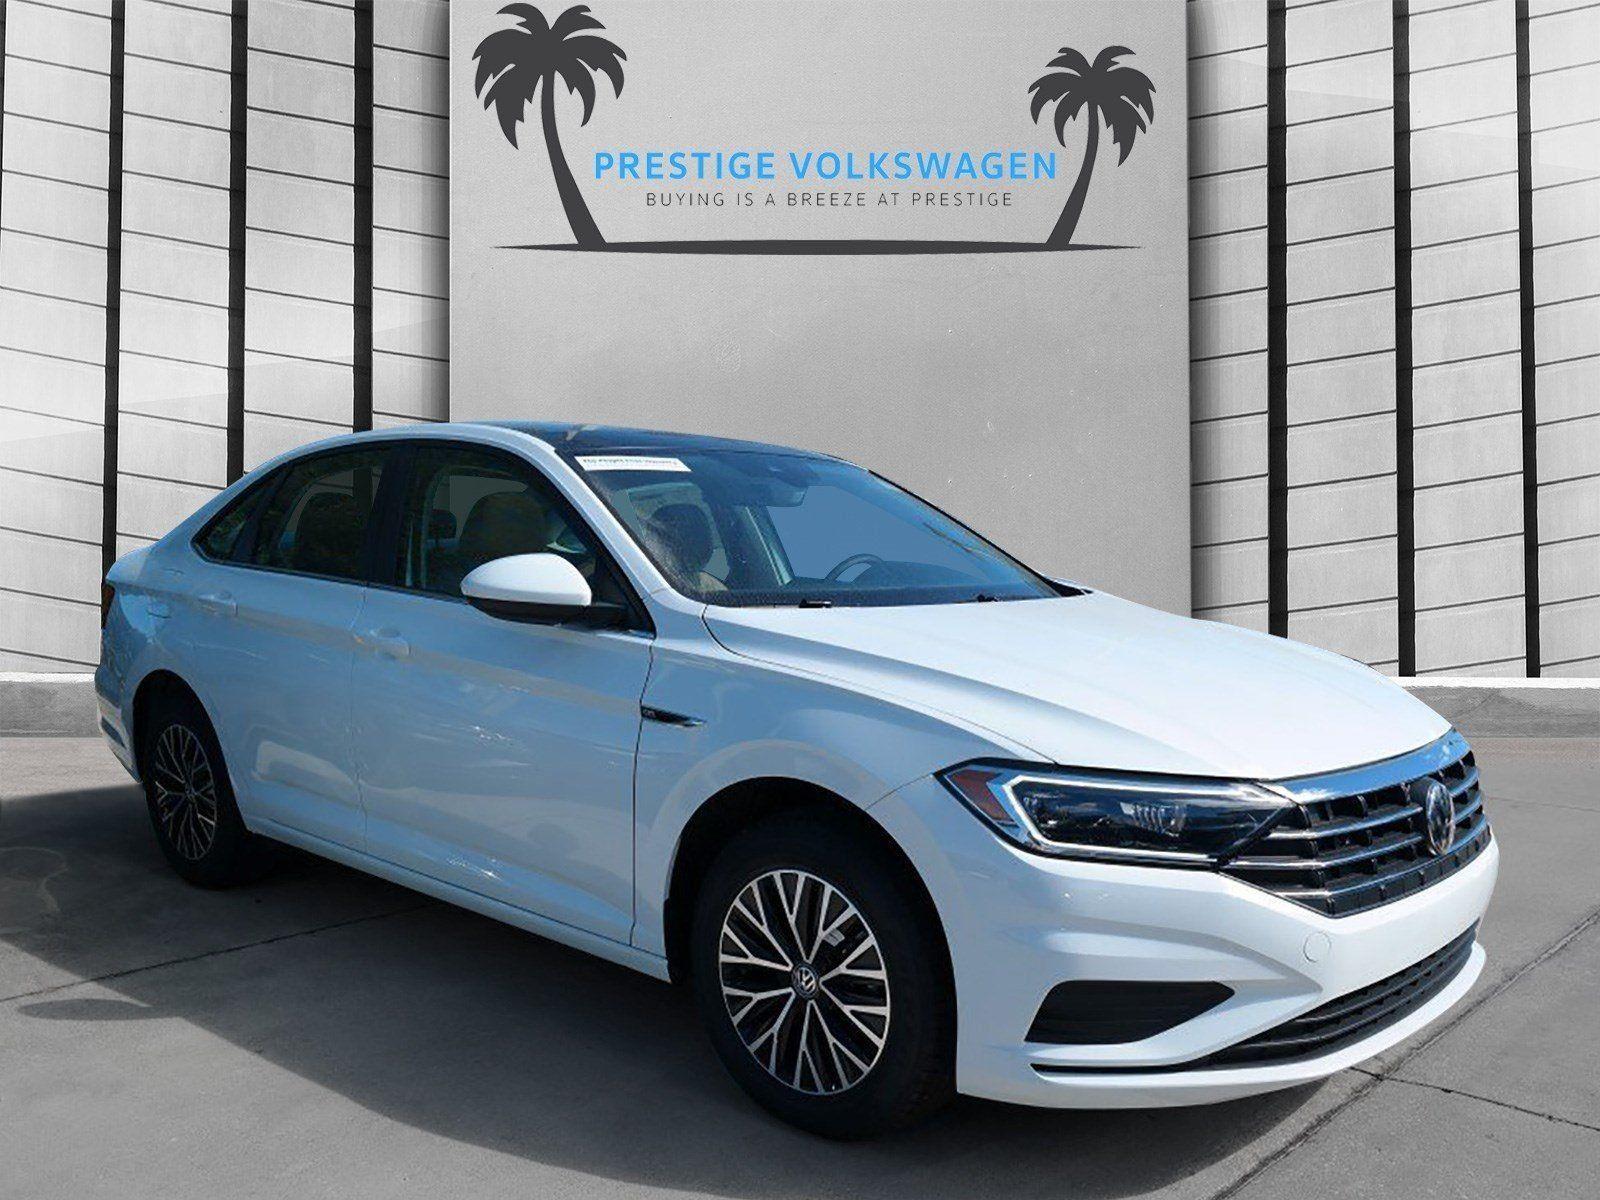 2019 Volkswagen Jetta Price In India Interior Exterior And Review Volkswagen Jetta Volkswagen Car Volkswagen